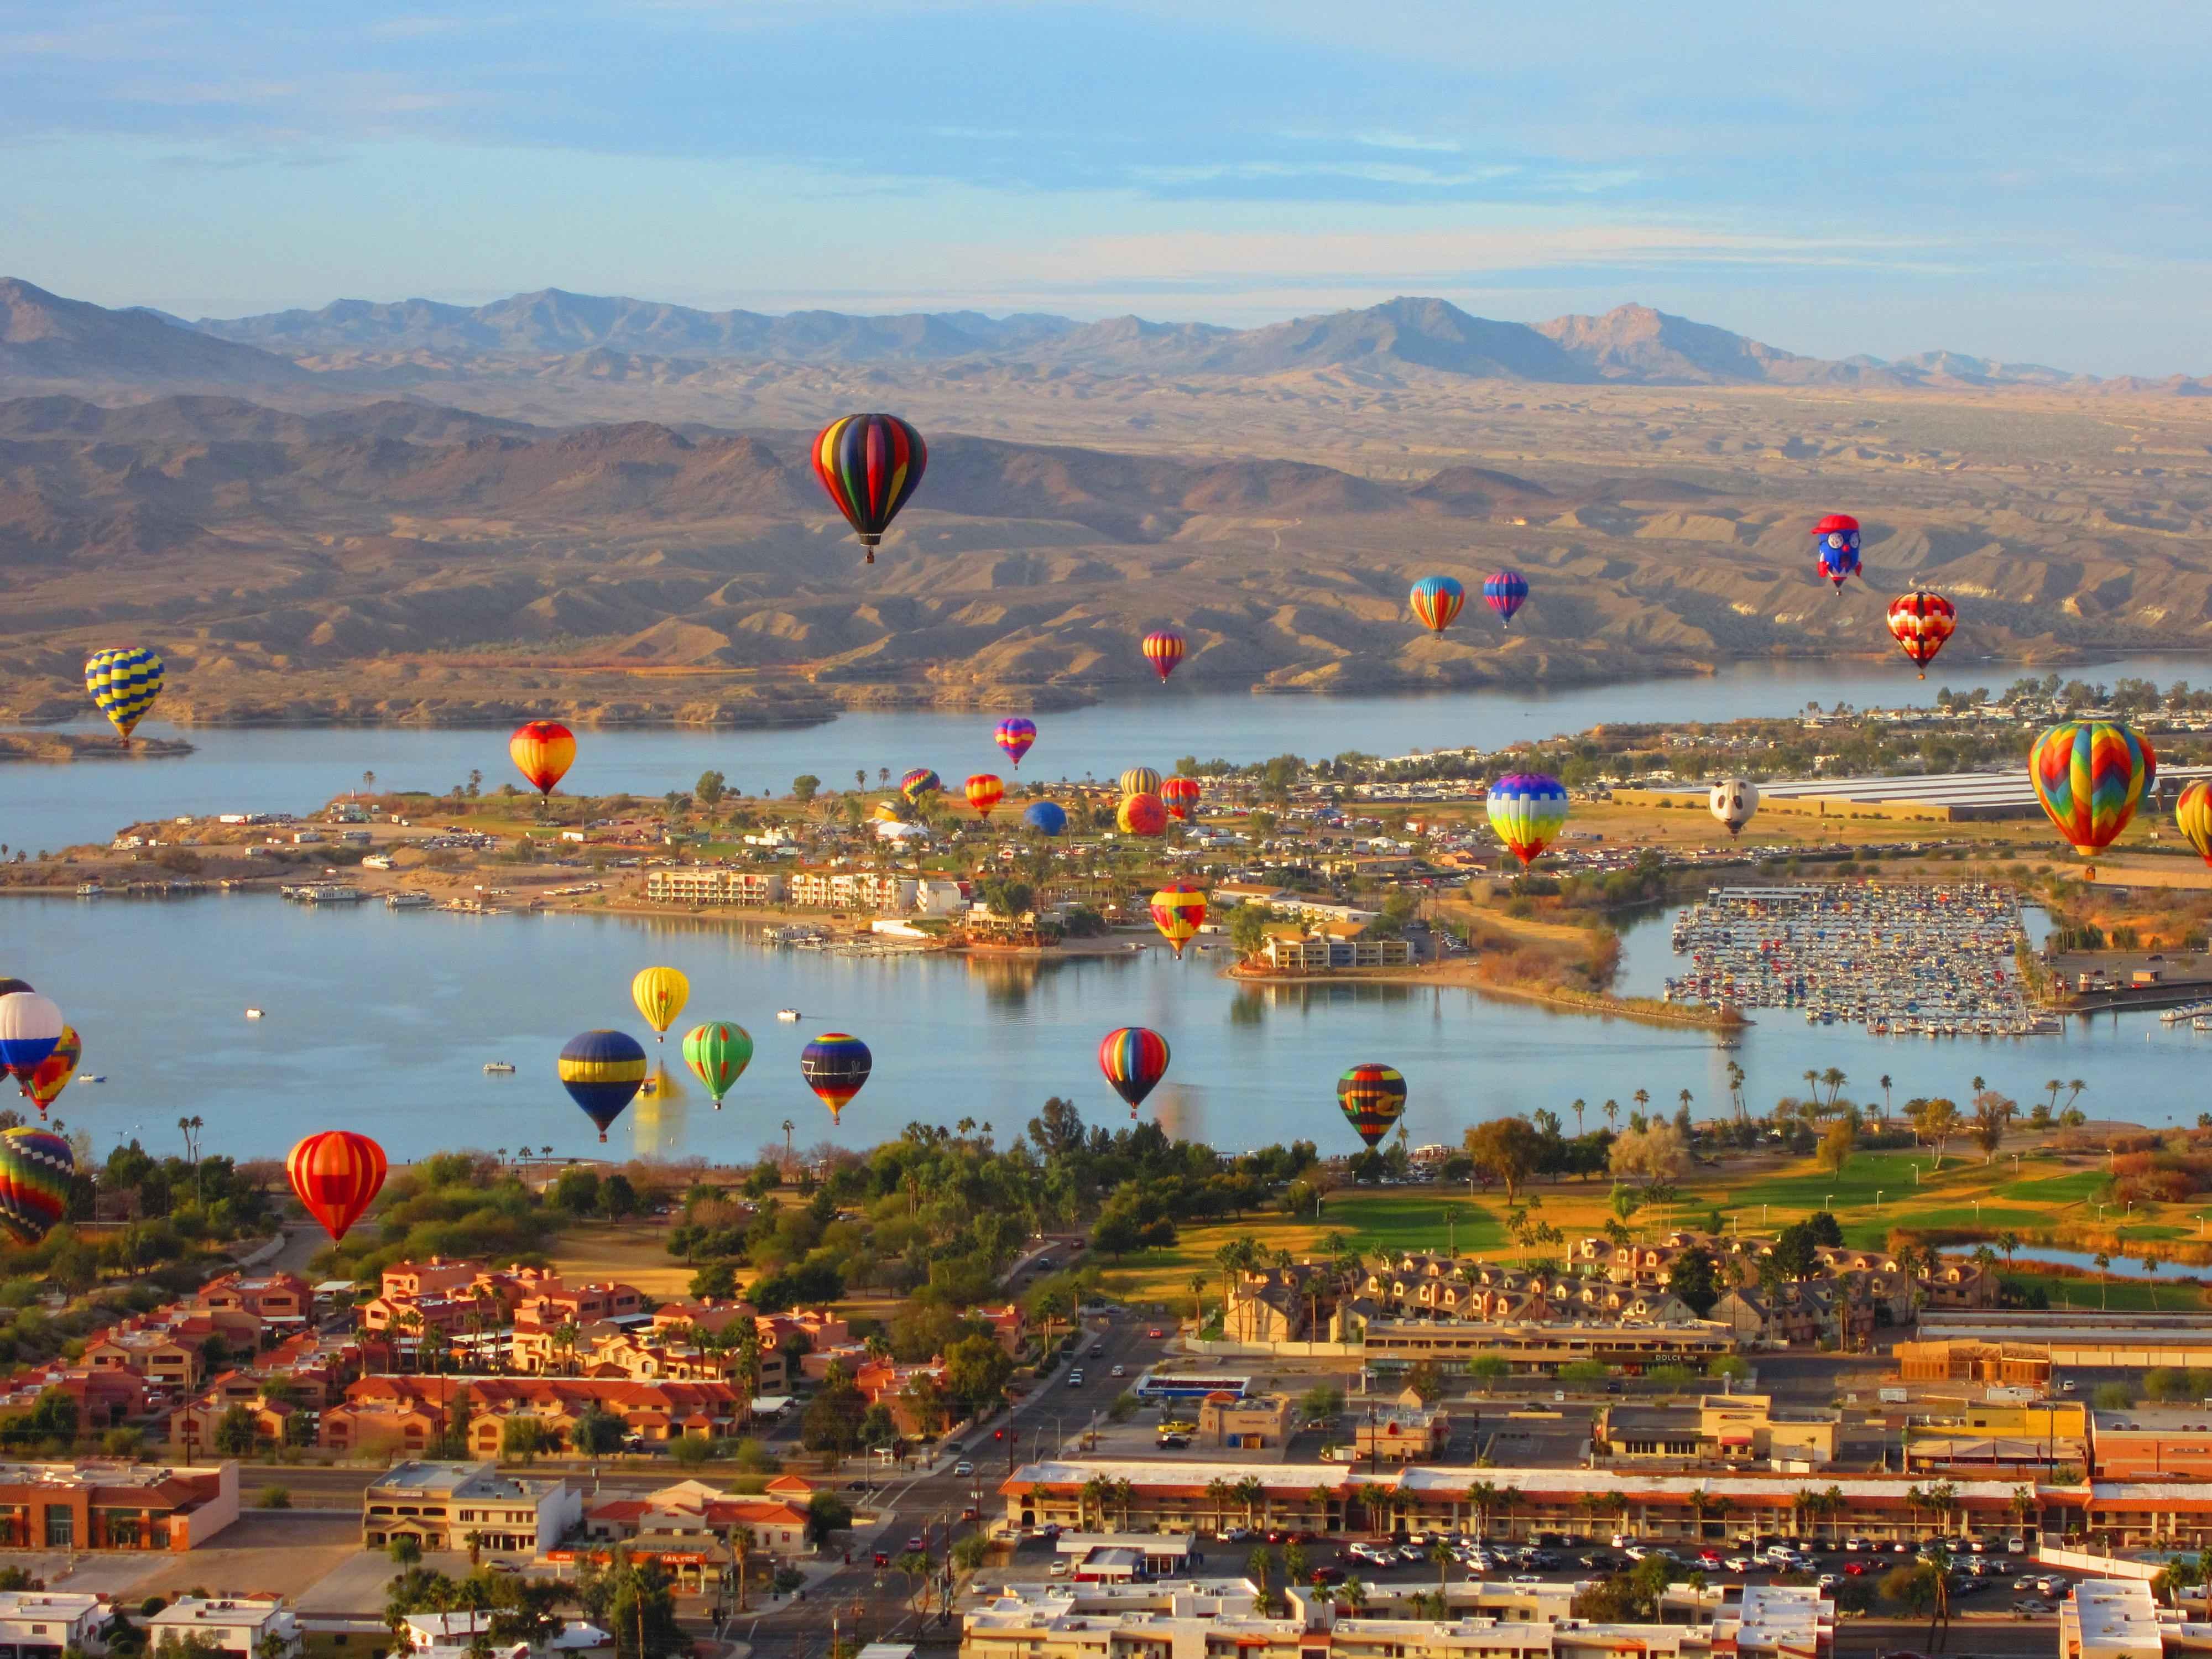 Lake Havasu Balloon Fest 2018